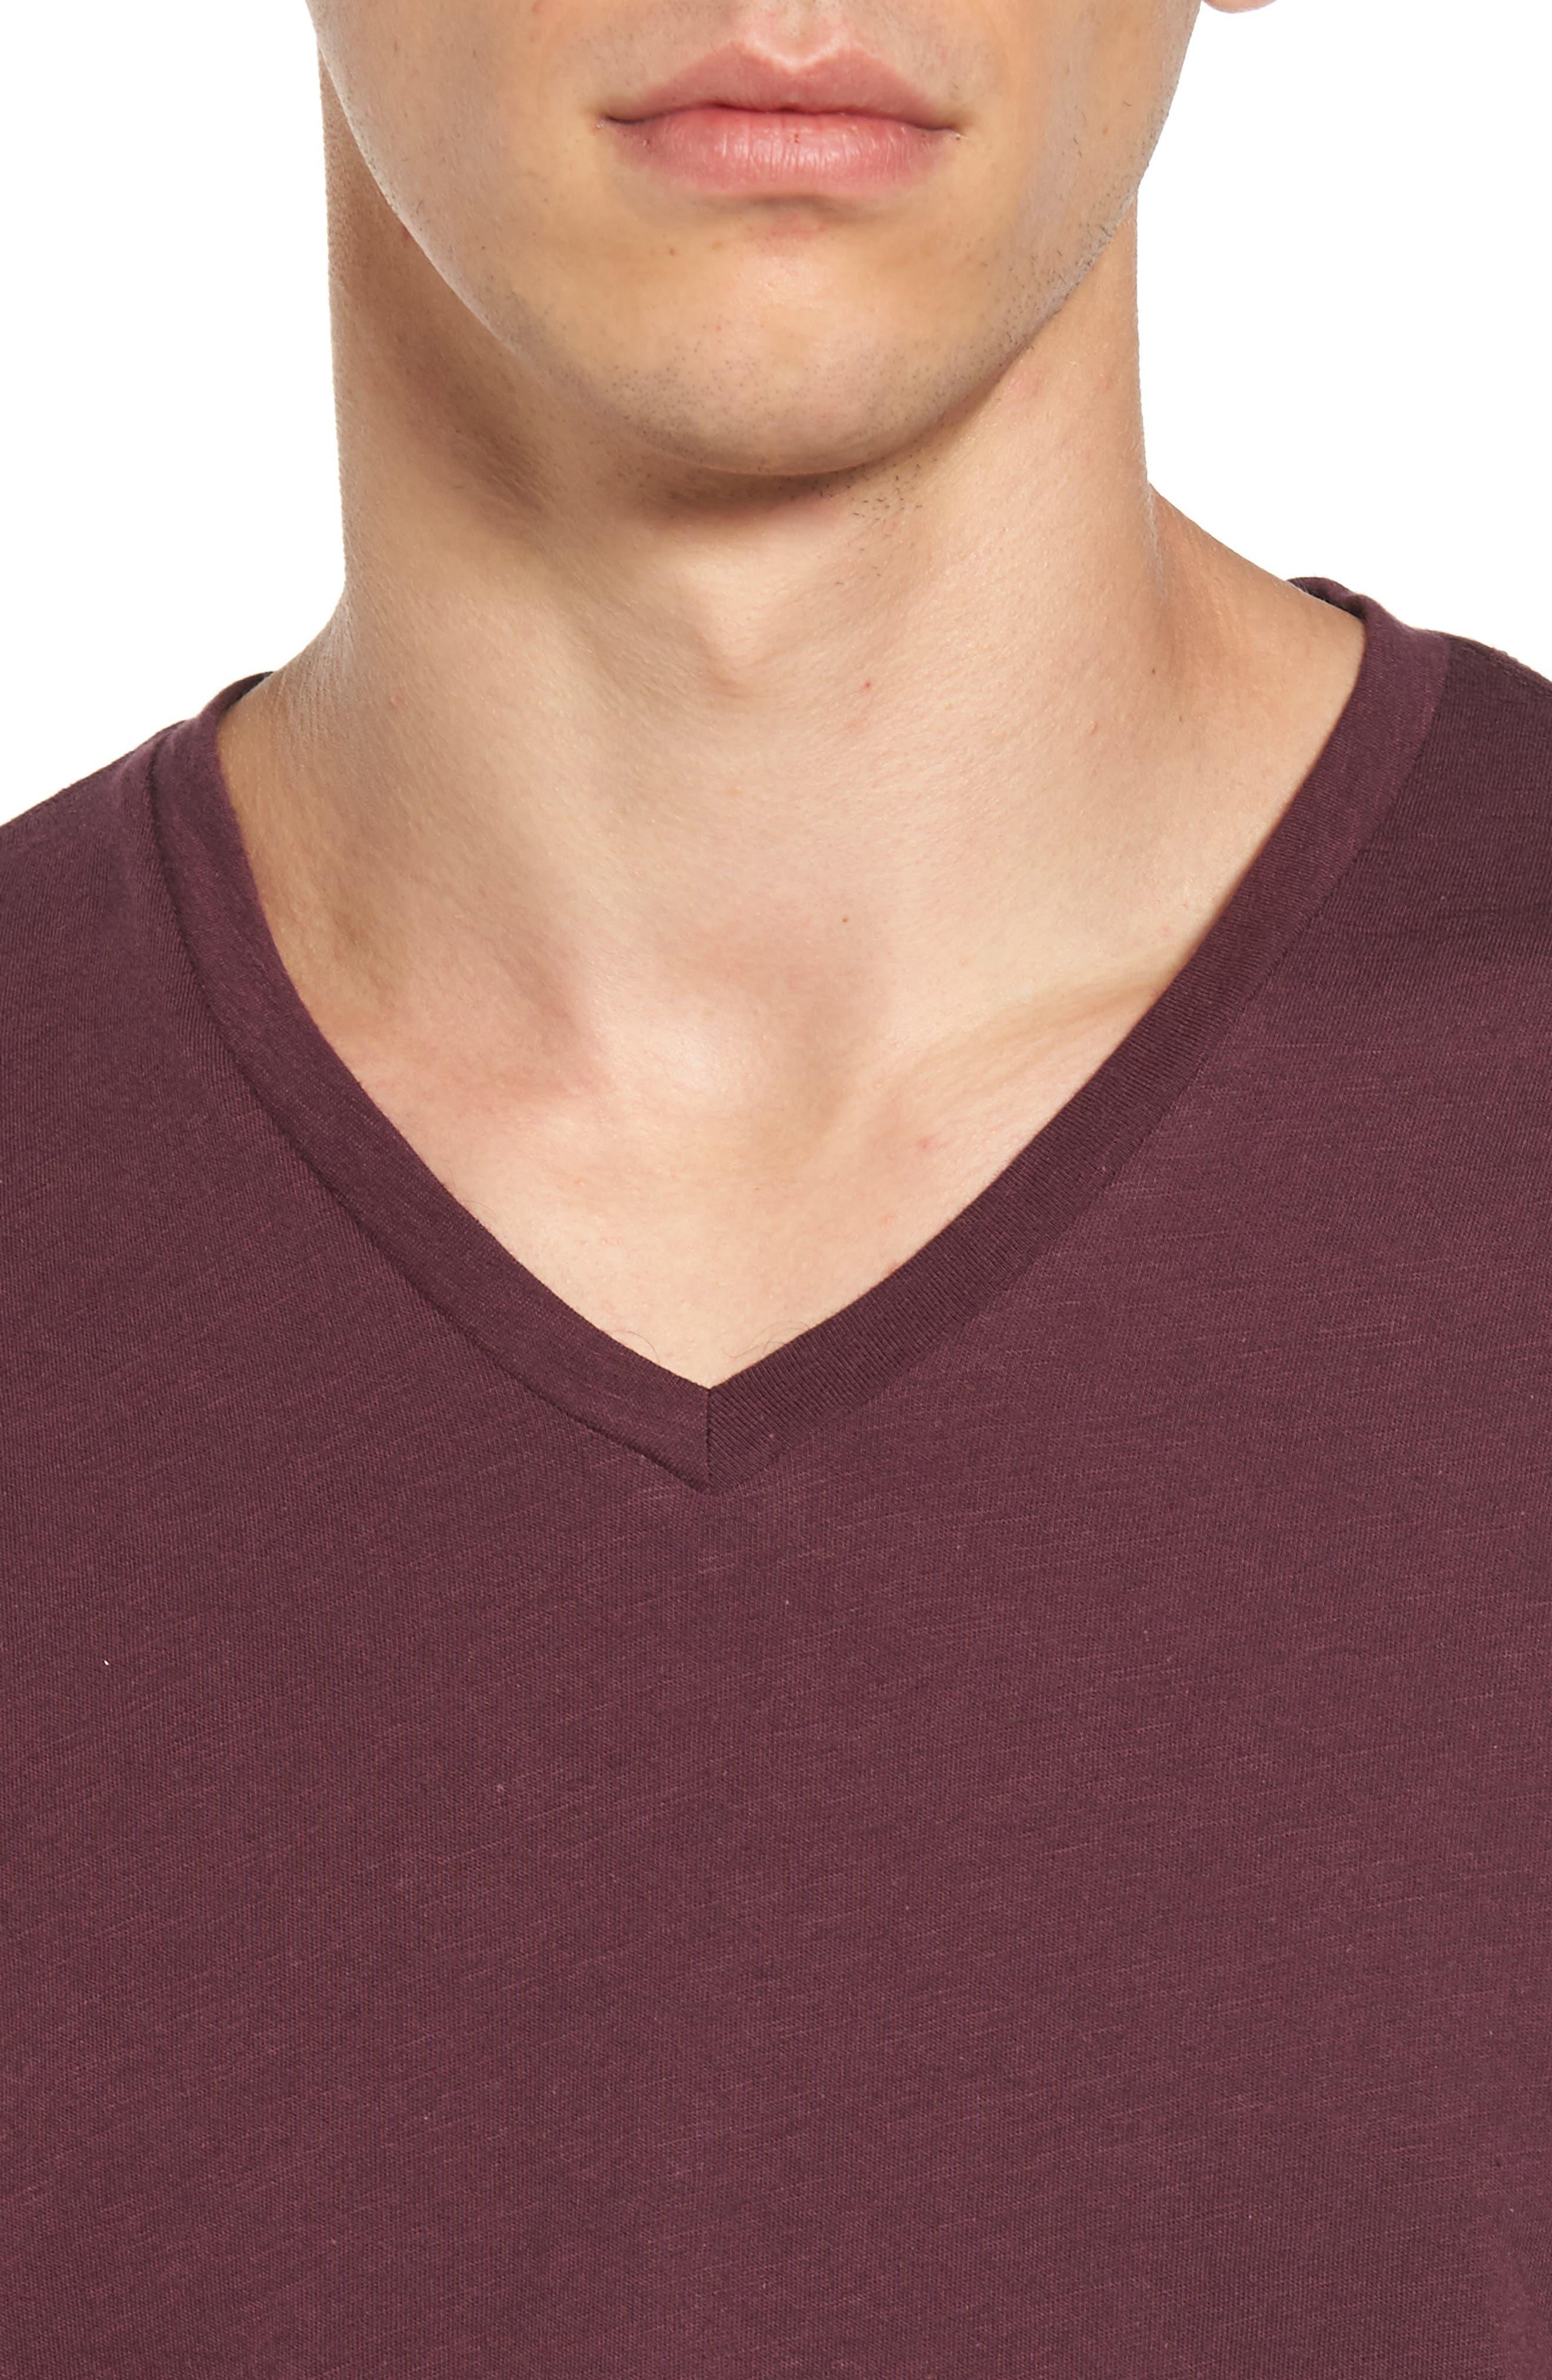 Alternate Image 4  - The Rail Slub Cotton V-Neck T-Shirt (2 for $30)